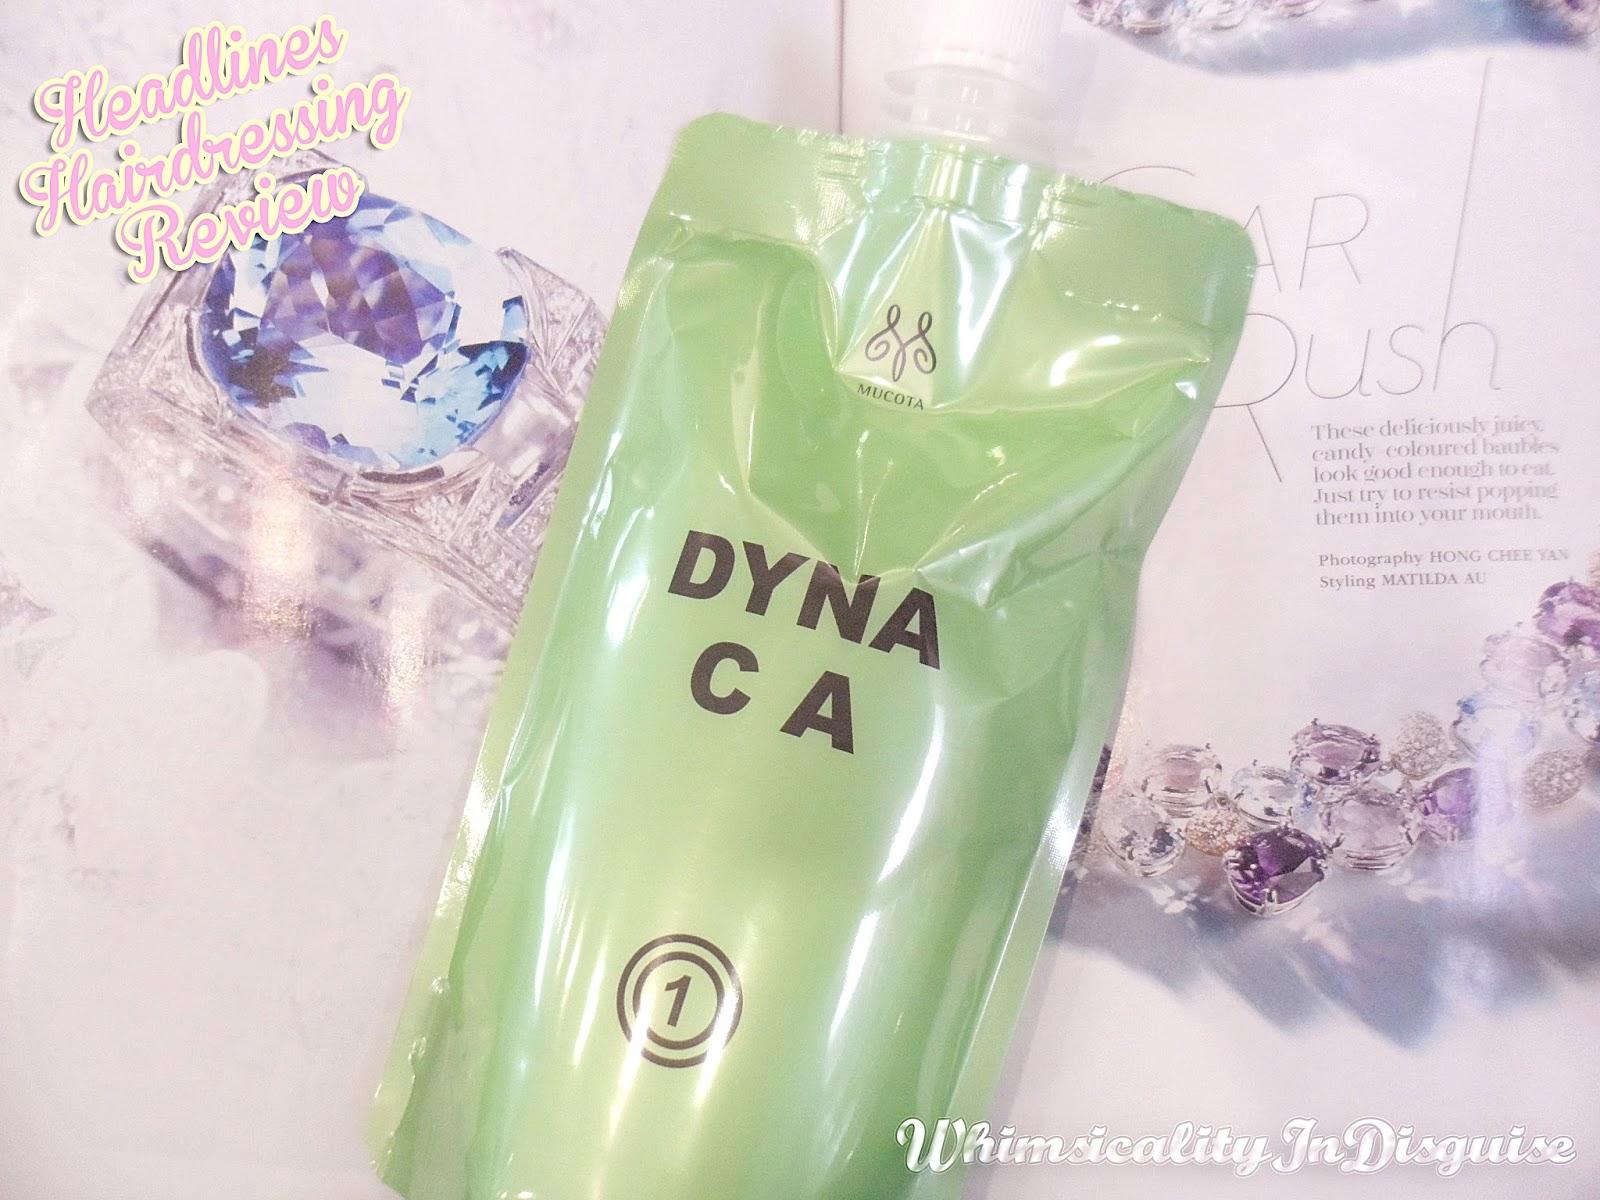 Mucota Dyna Argan Oil Treatment review